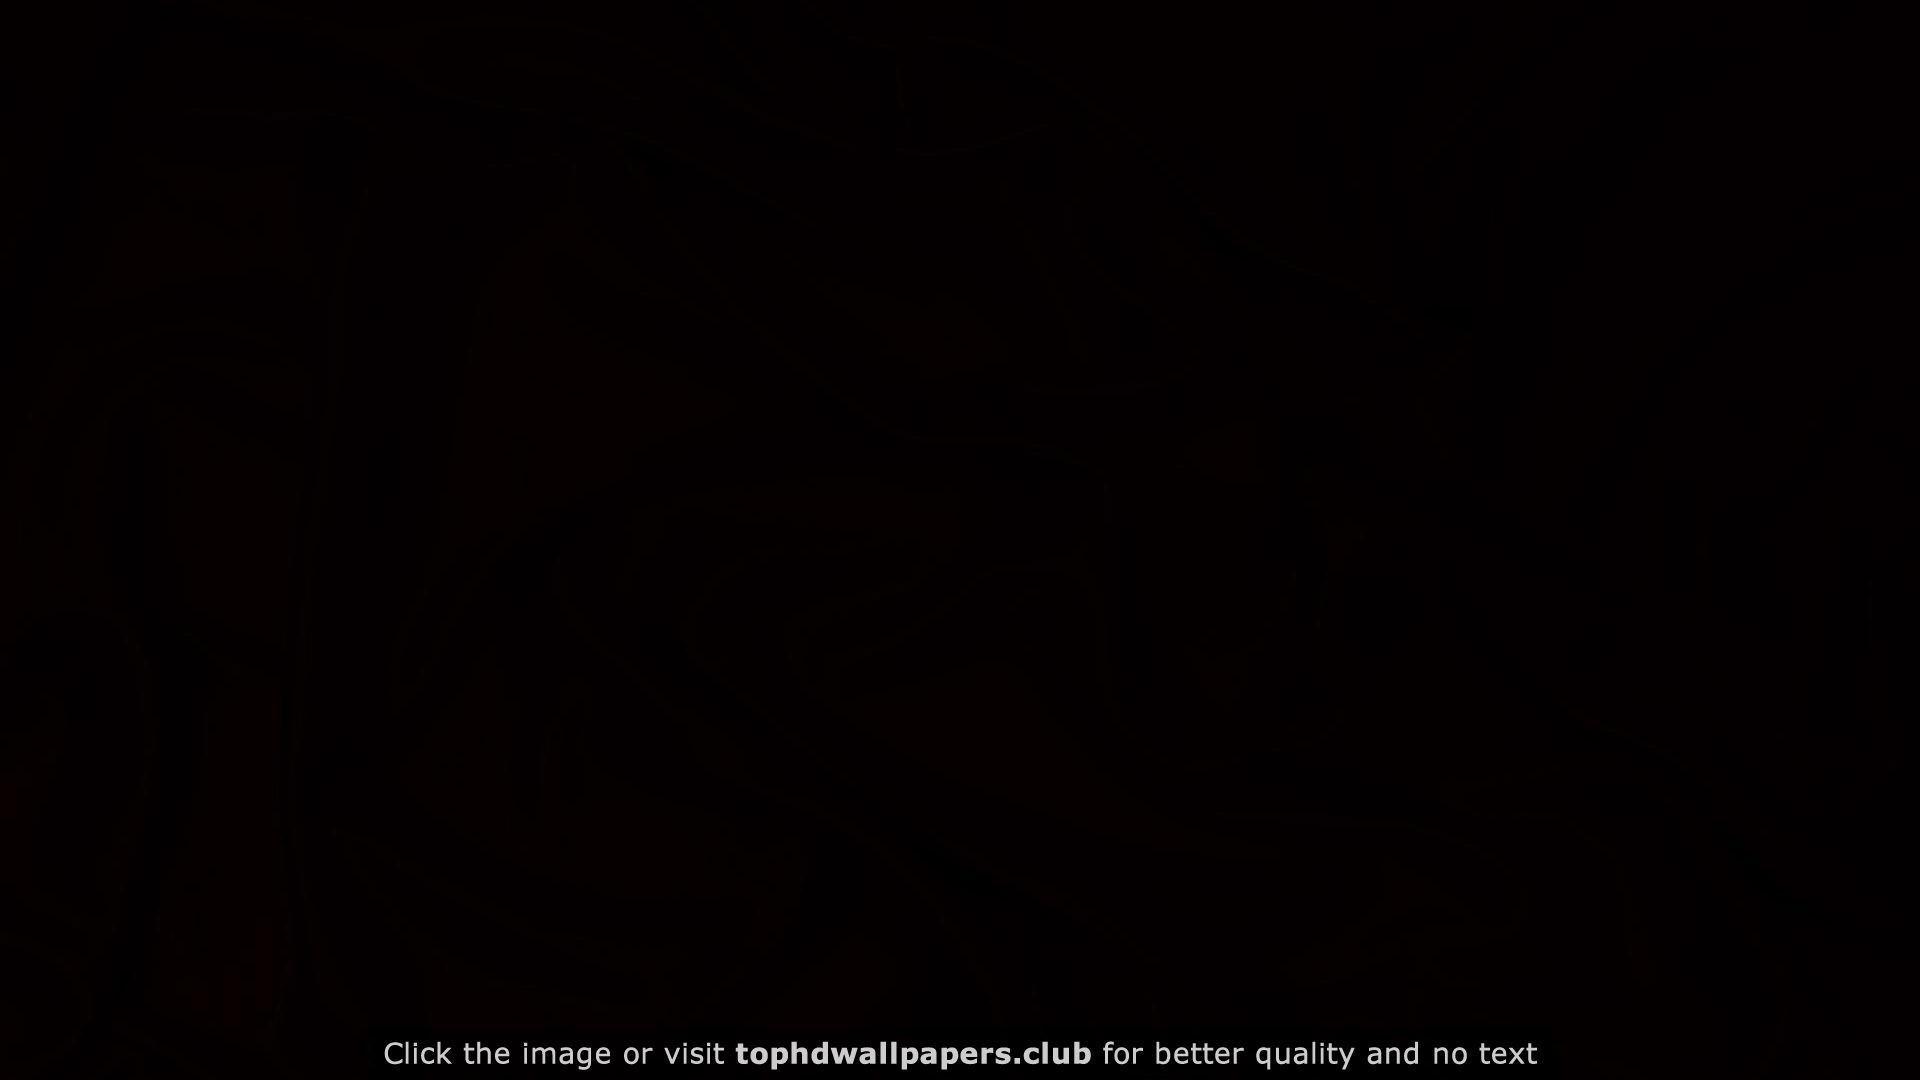 Ultralinx Wallpaper Iphone X 4k Black Wallpaper 57 Images